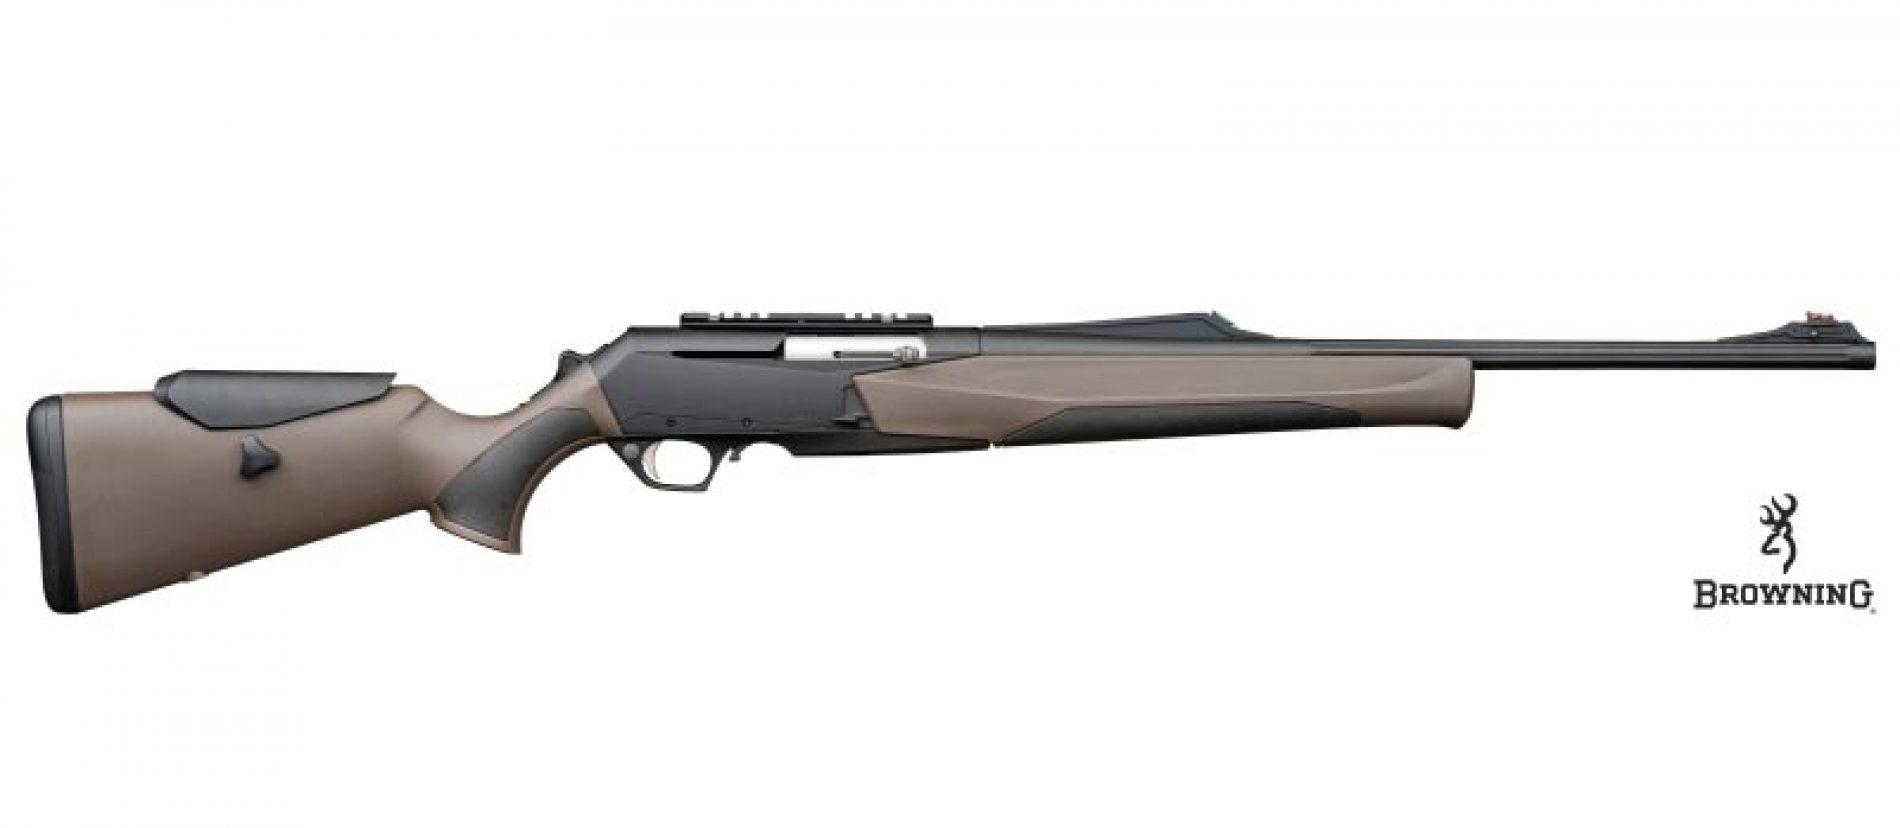 Nuevo rifle semiautomatico BAR MK3 COMPOSITE BROWN HC THREADED